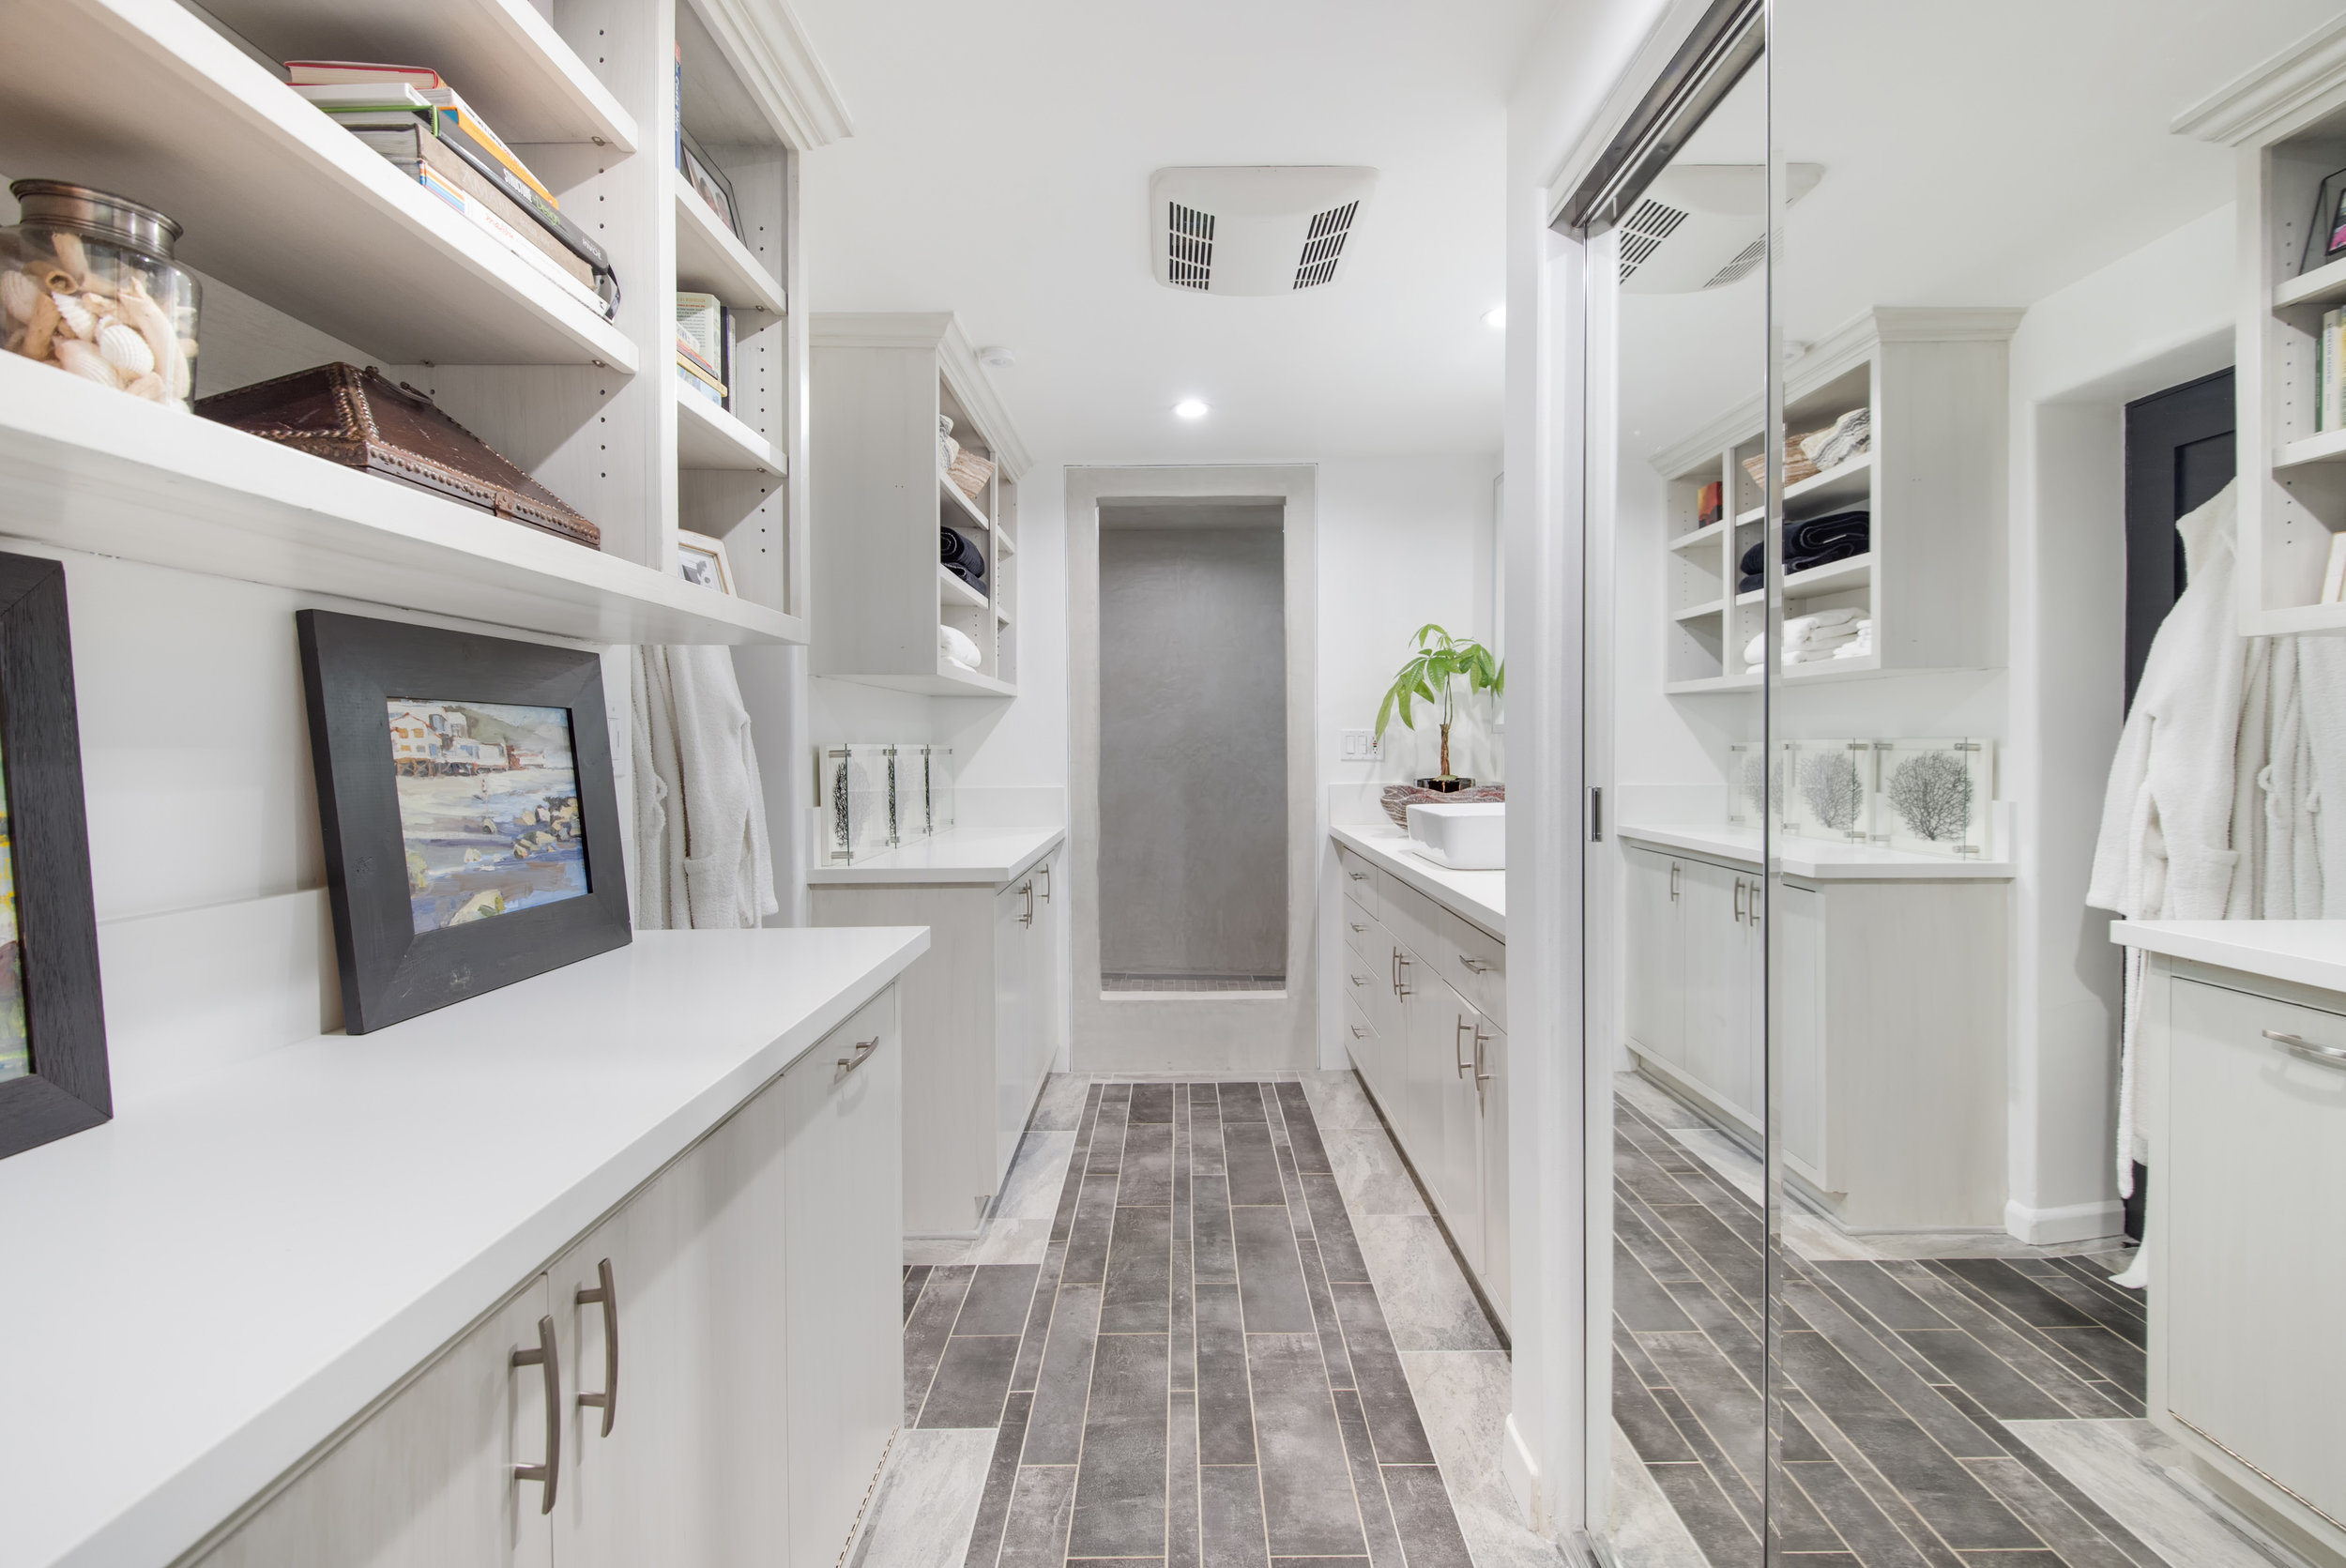 027 Bathroom 26272 Cool Glen Way Malibu For Sale Luxury Real Estate.jpg